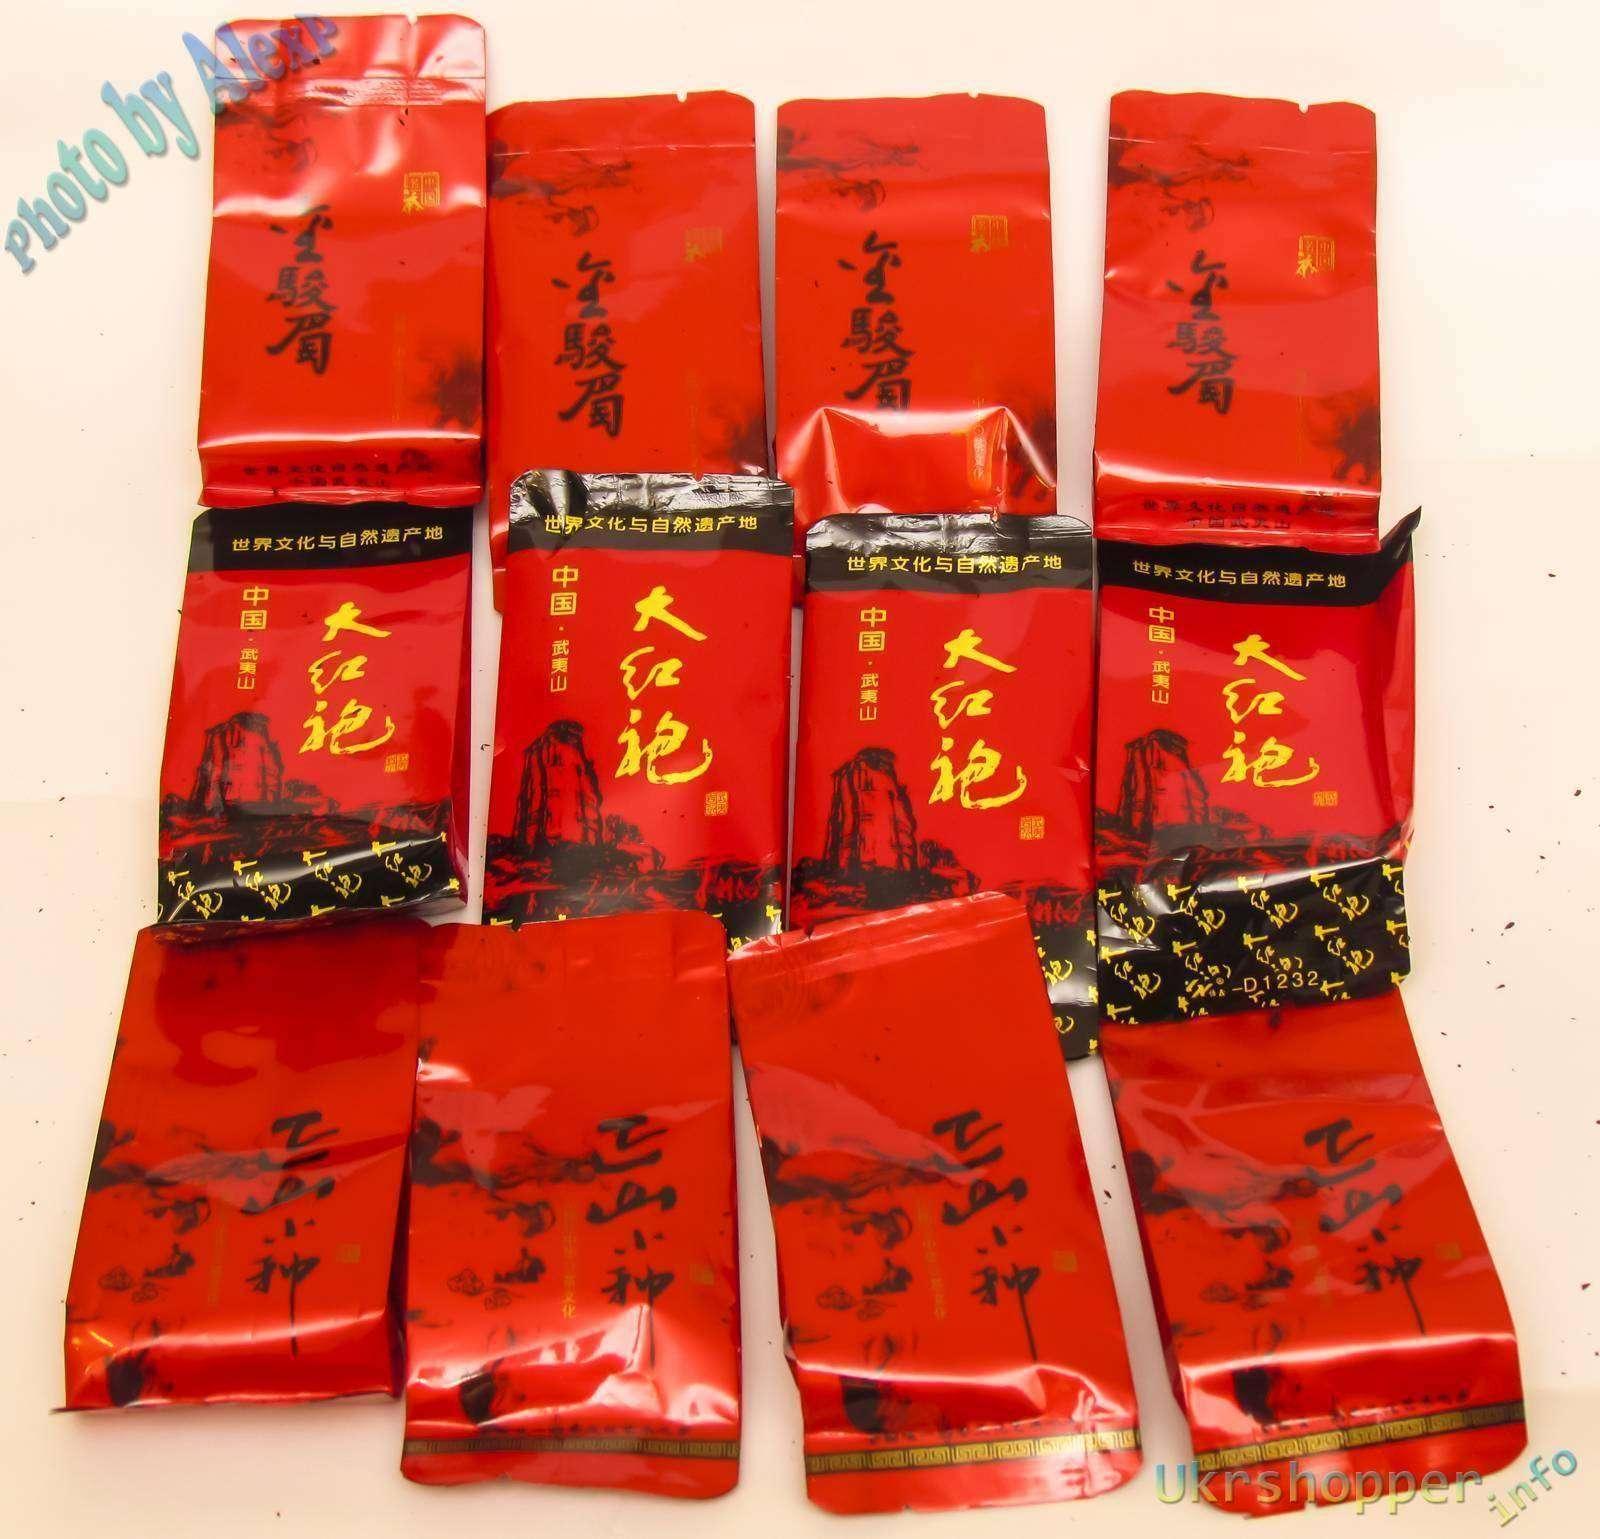 Aliexpress: Обзор недорогого китайского чая